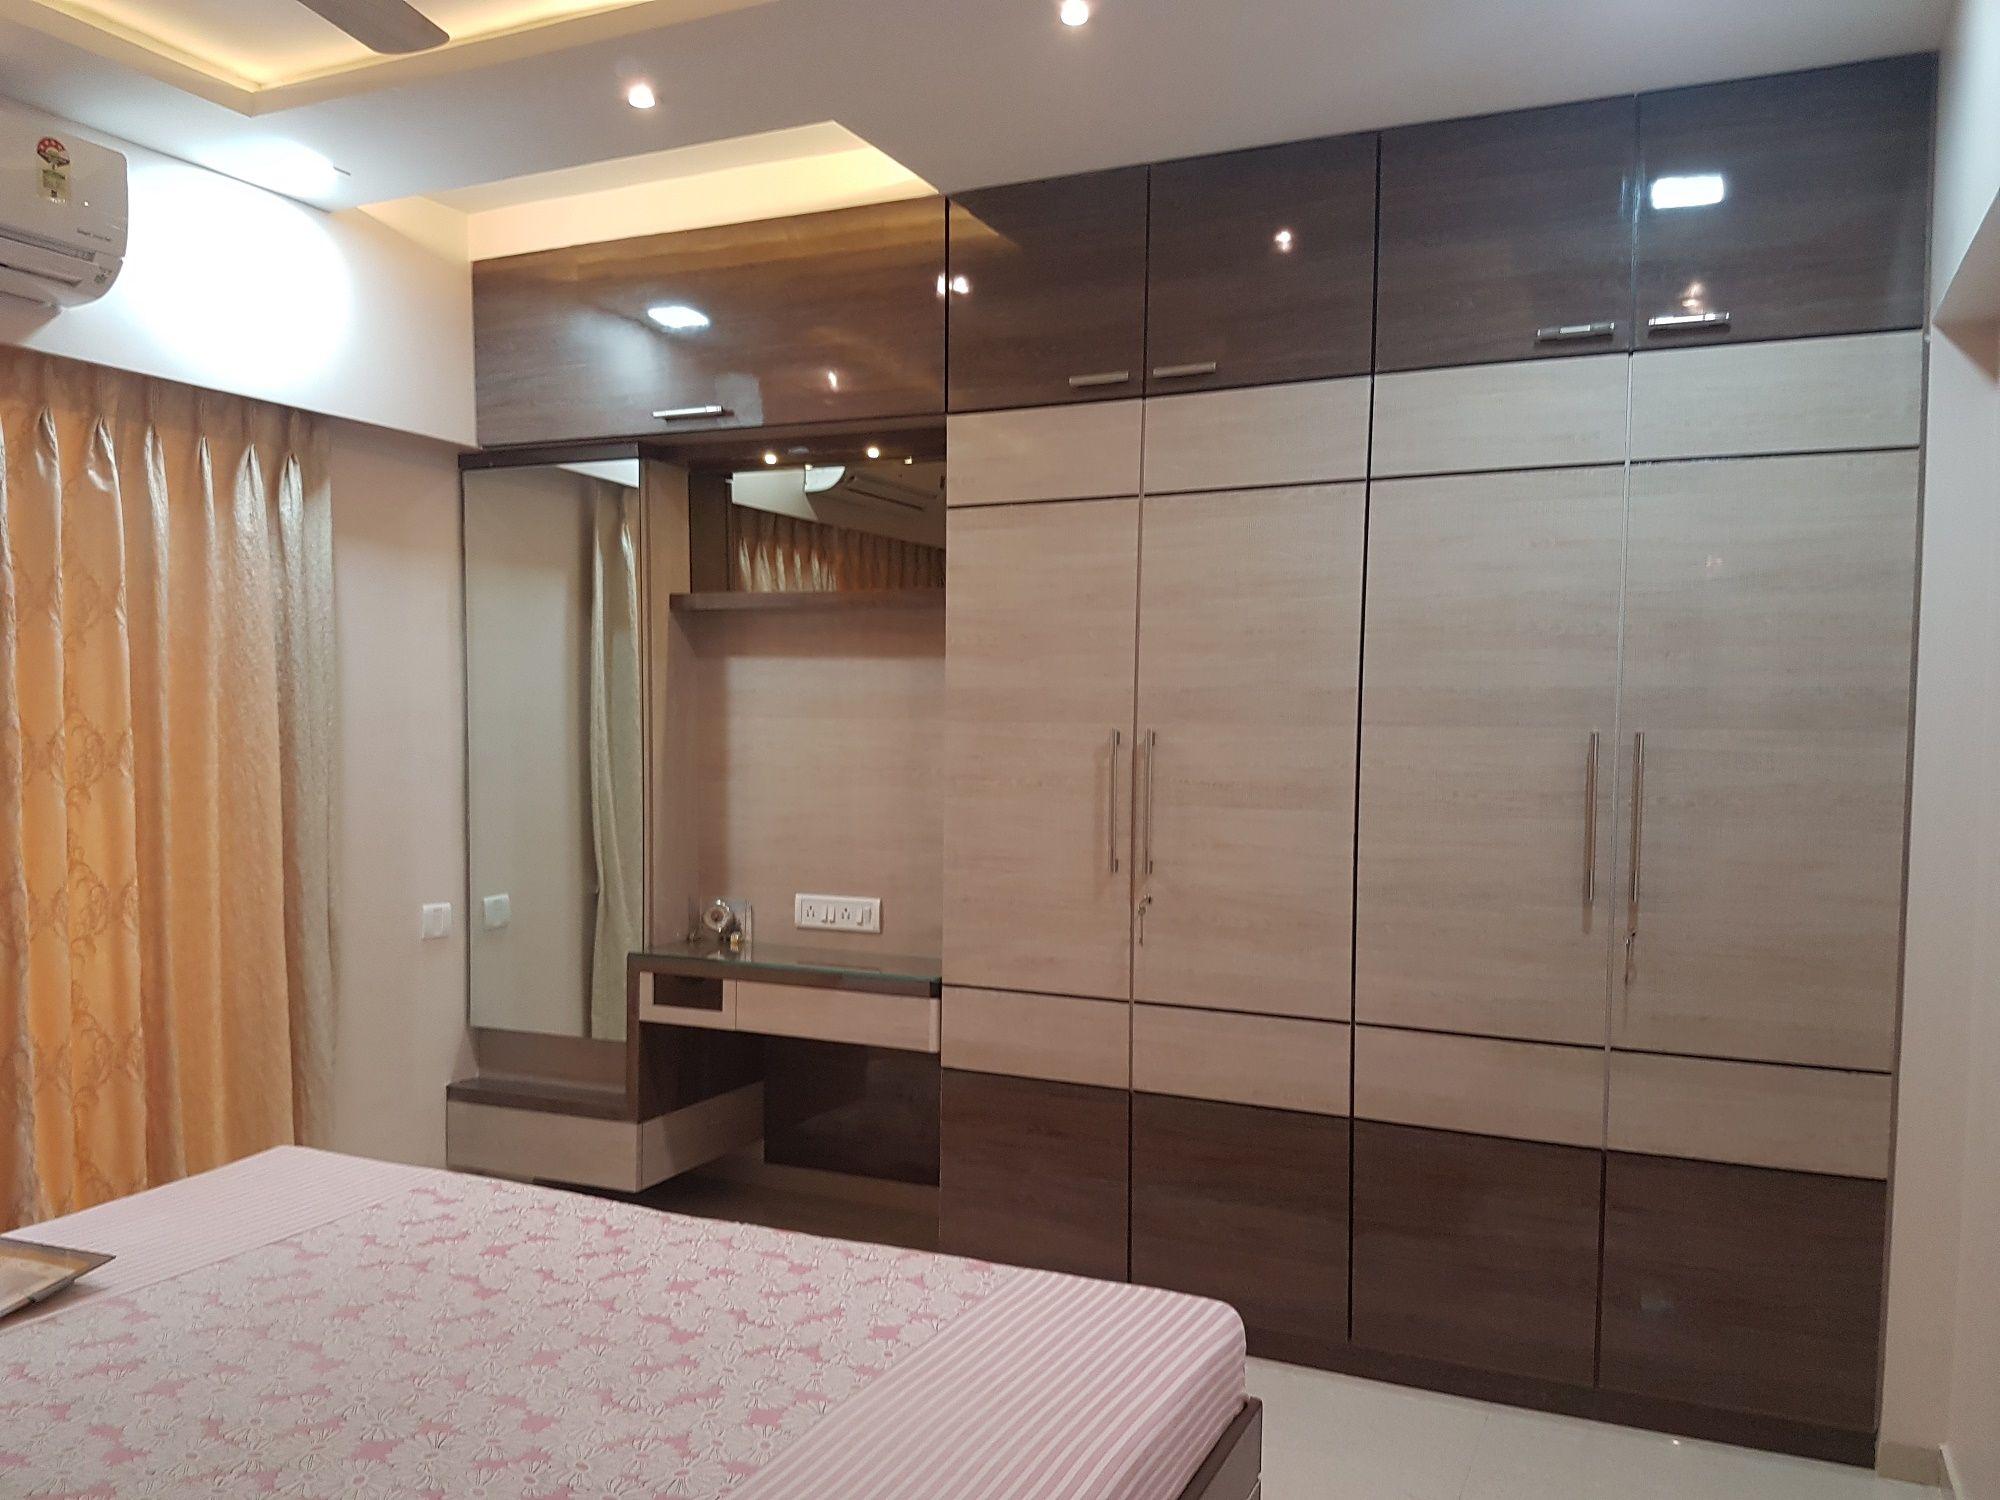 wardrobe design for bedroom | Wardrobe interior design ...